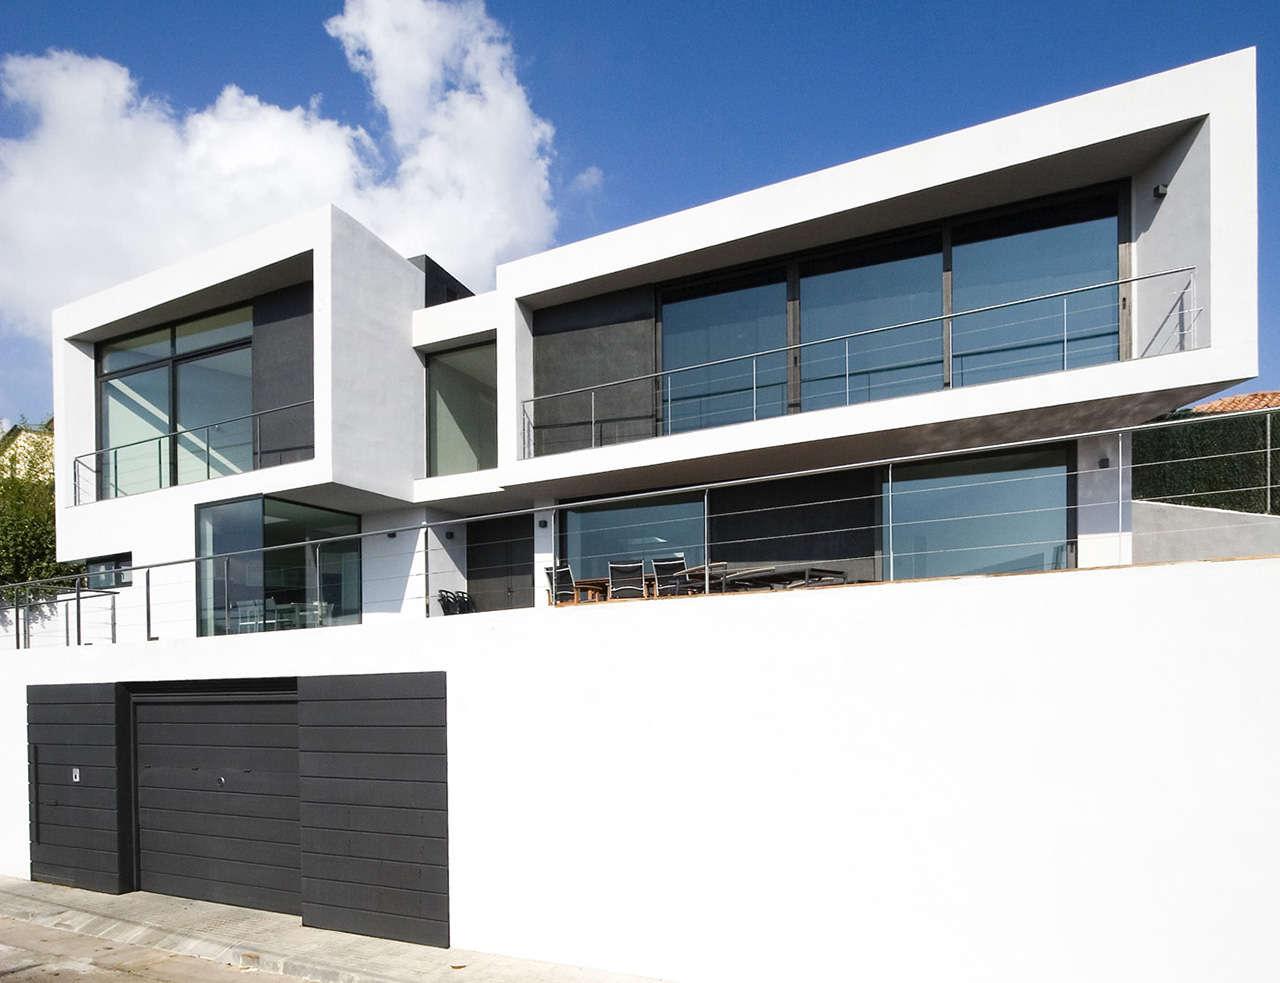 Vivienda Unifamiliar Pineda de Mar obra nueva fachada